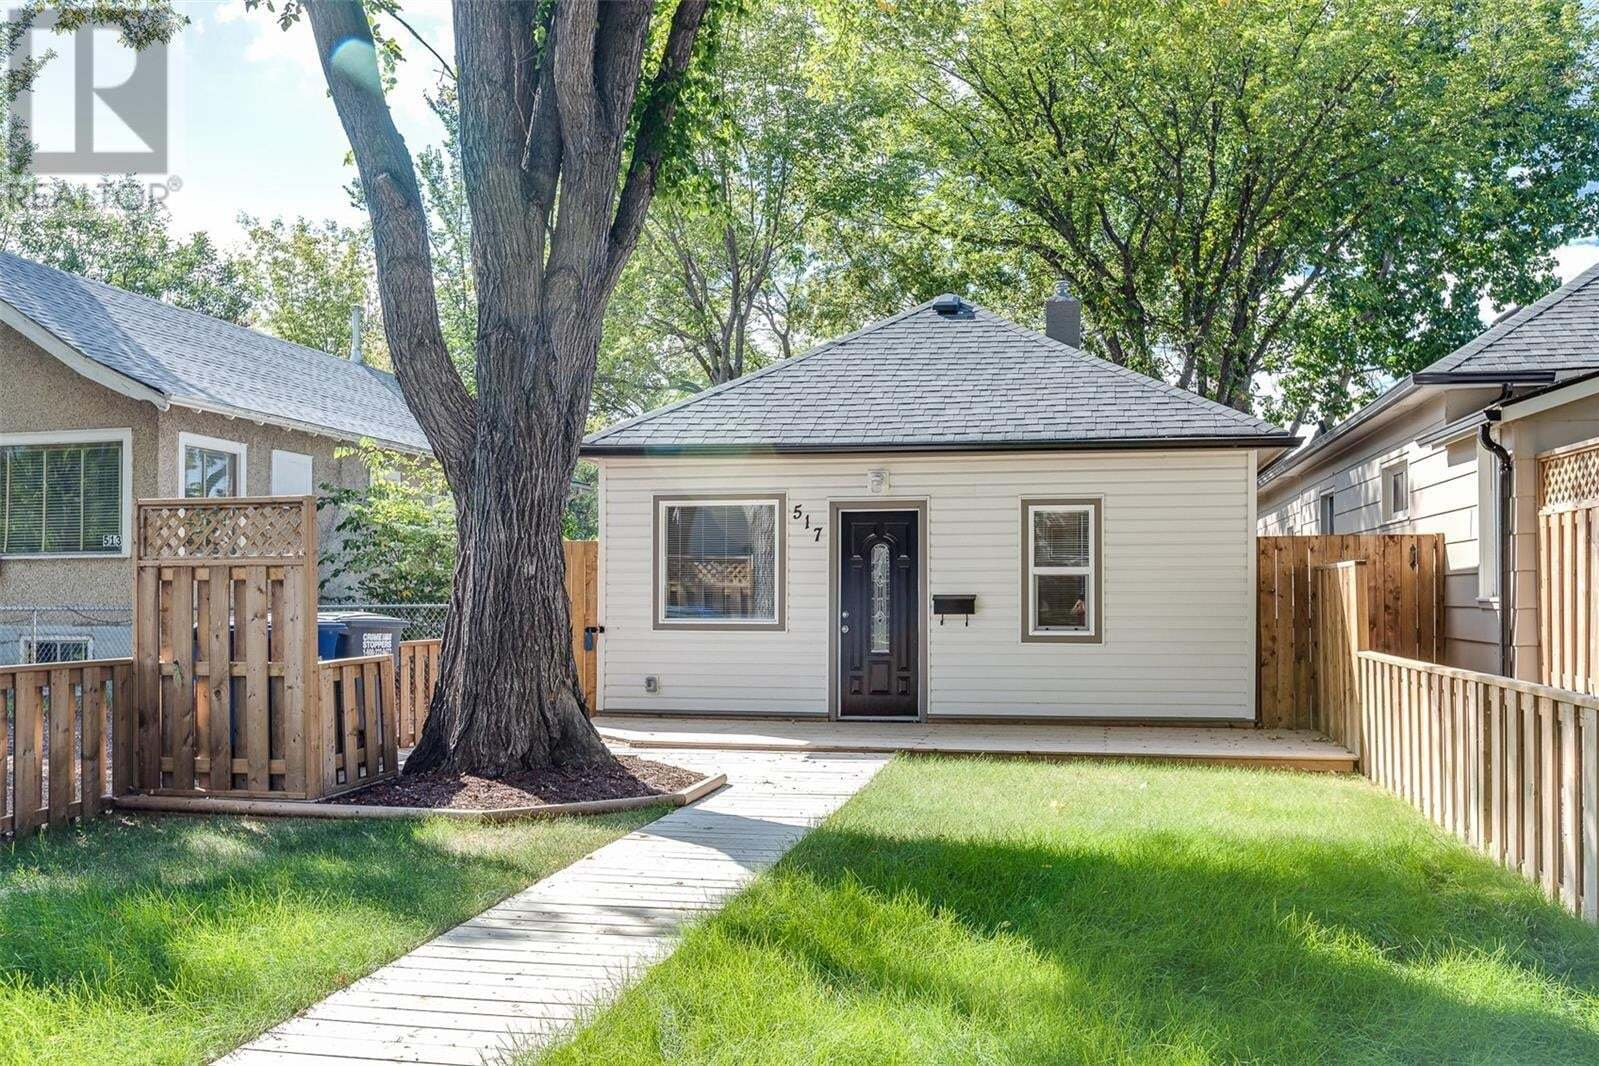 House for sale at 517 K Ave N Saskatoon Saskatchewan - MLS: SK826525